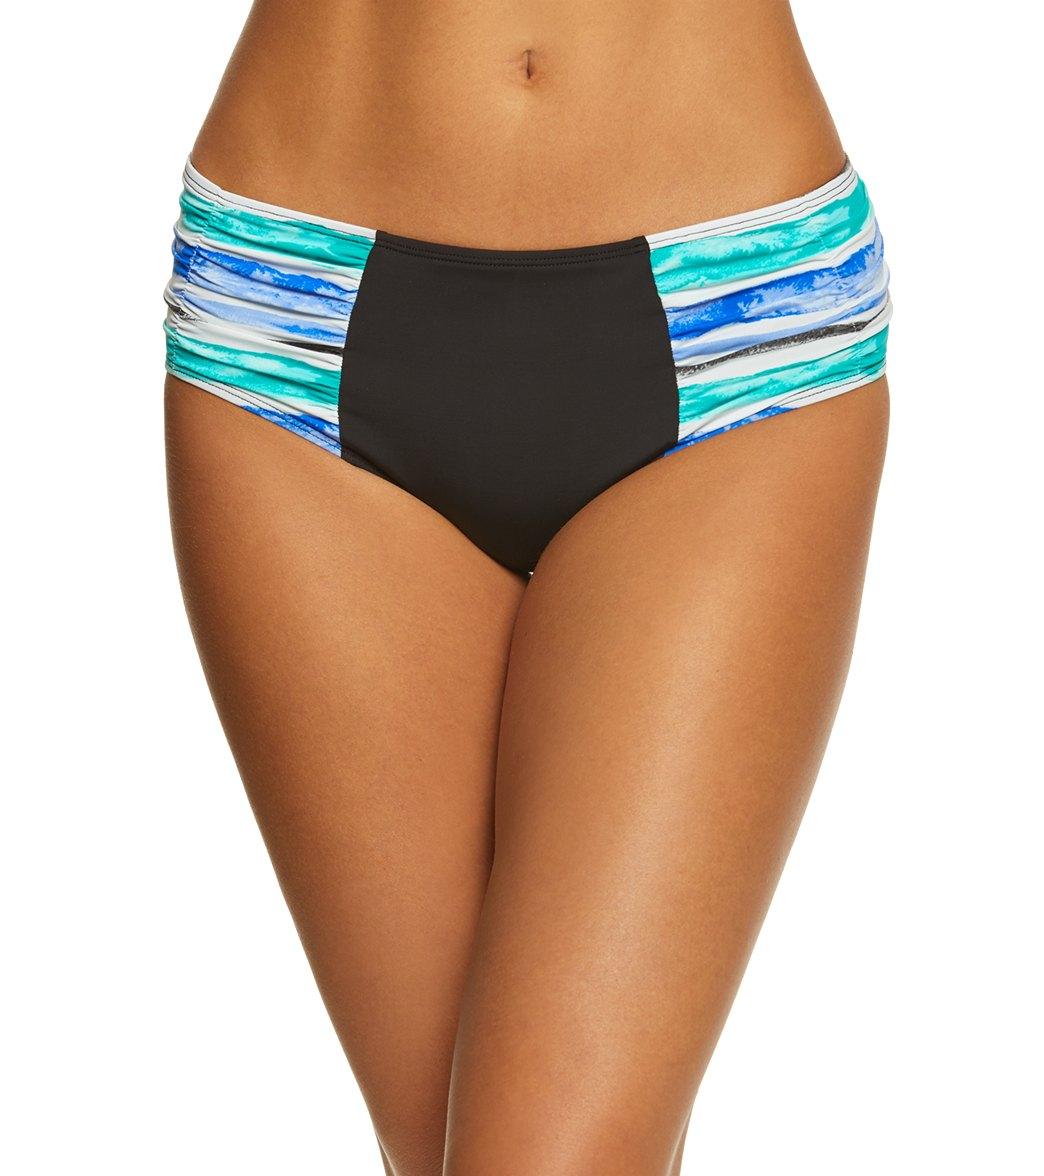 39527808cd Skye Aqueous Alessia High Rise Bikini Bottom at SwimOutlet.com - Free  Shipping